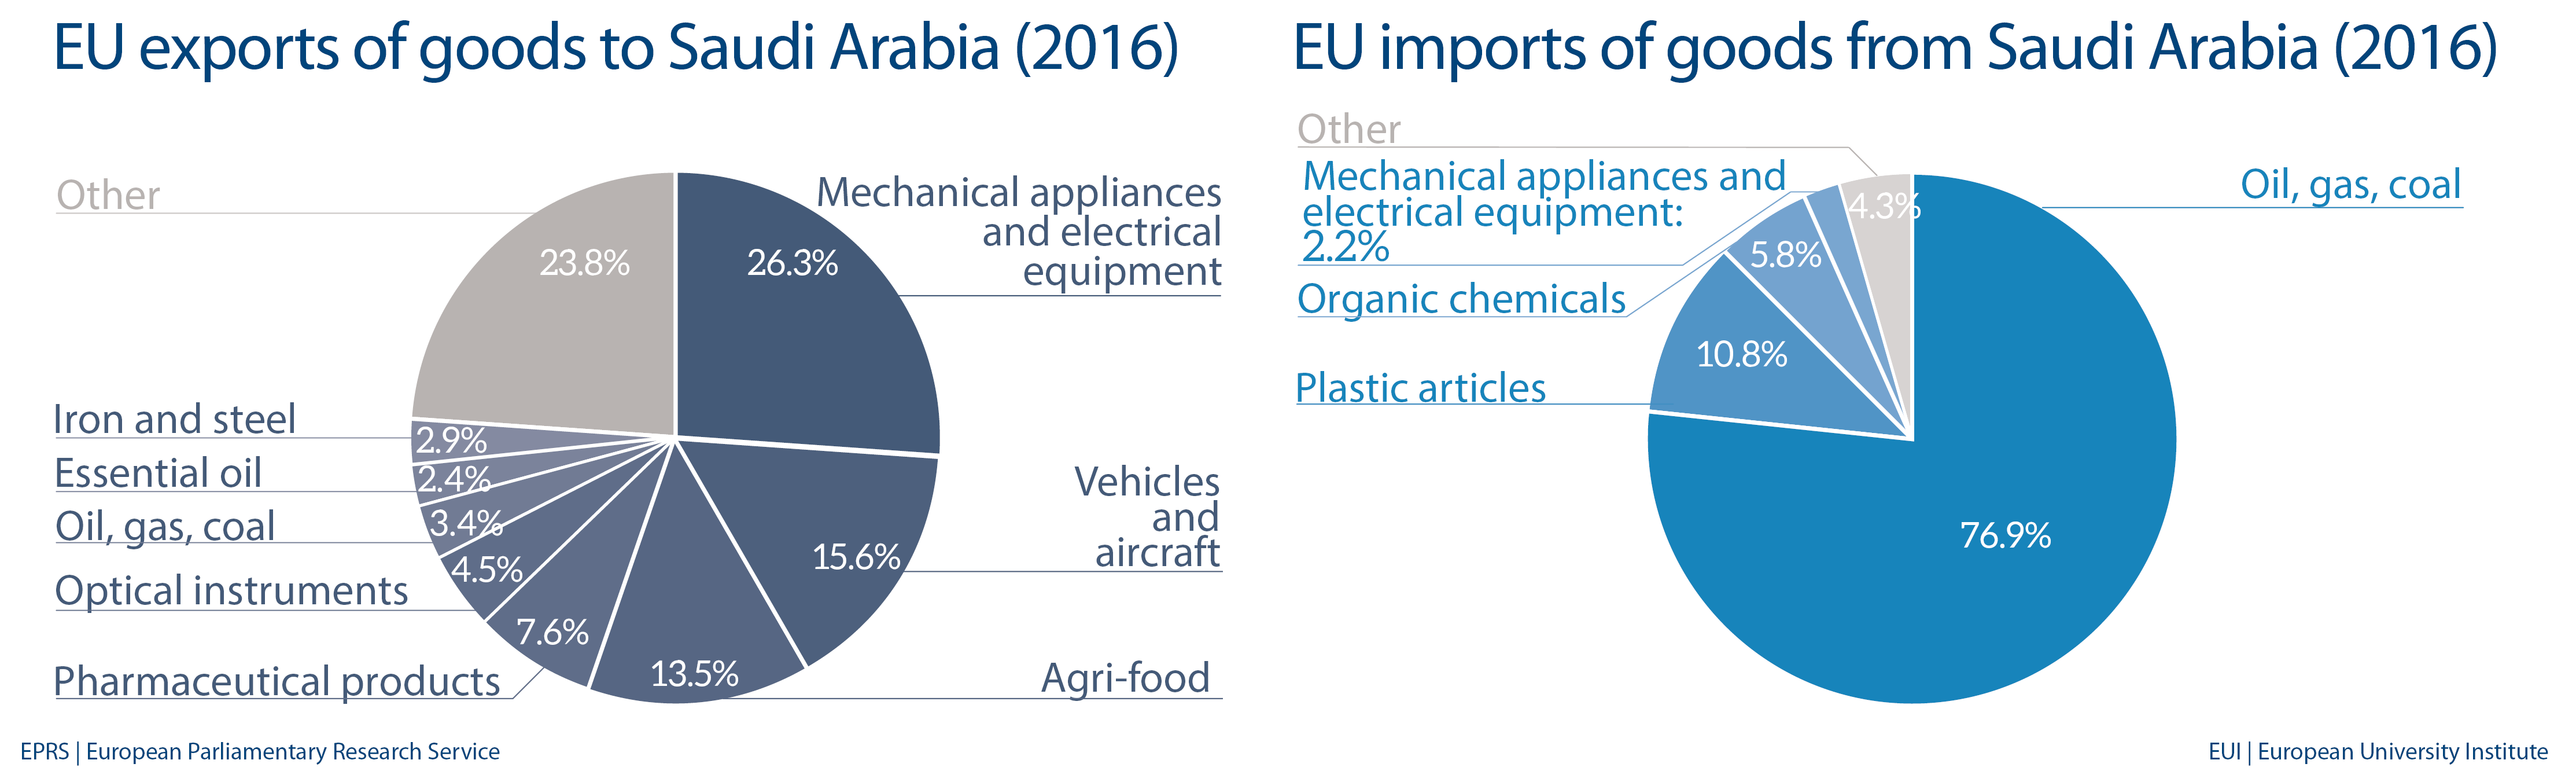 Saudi Arabia: Economic indicators and trade with EU